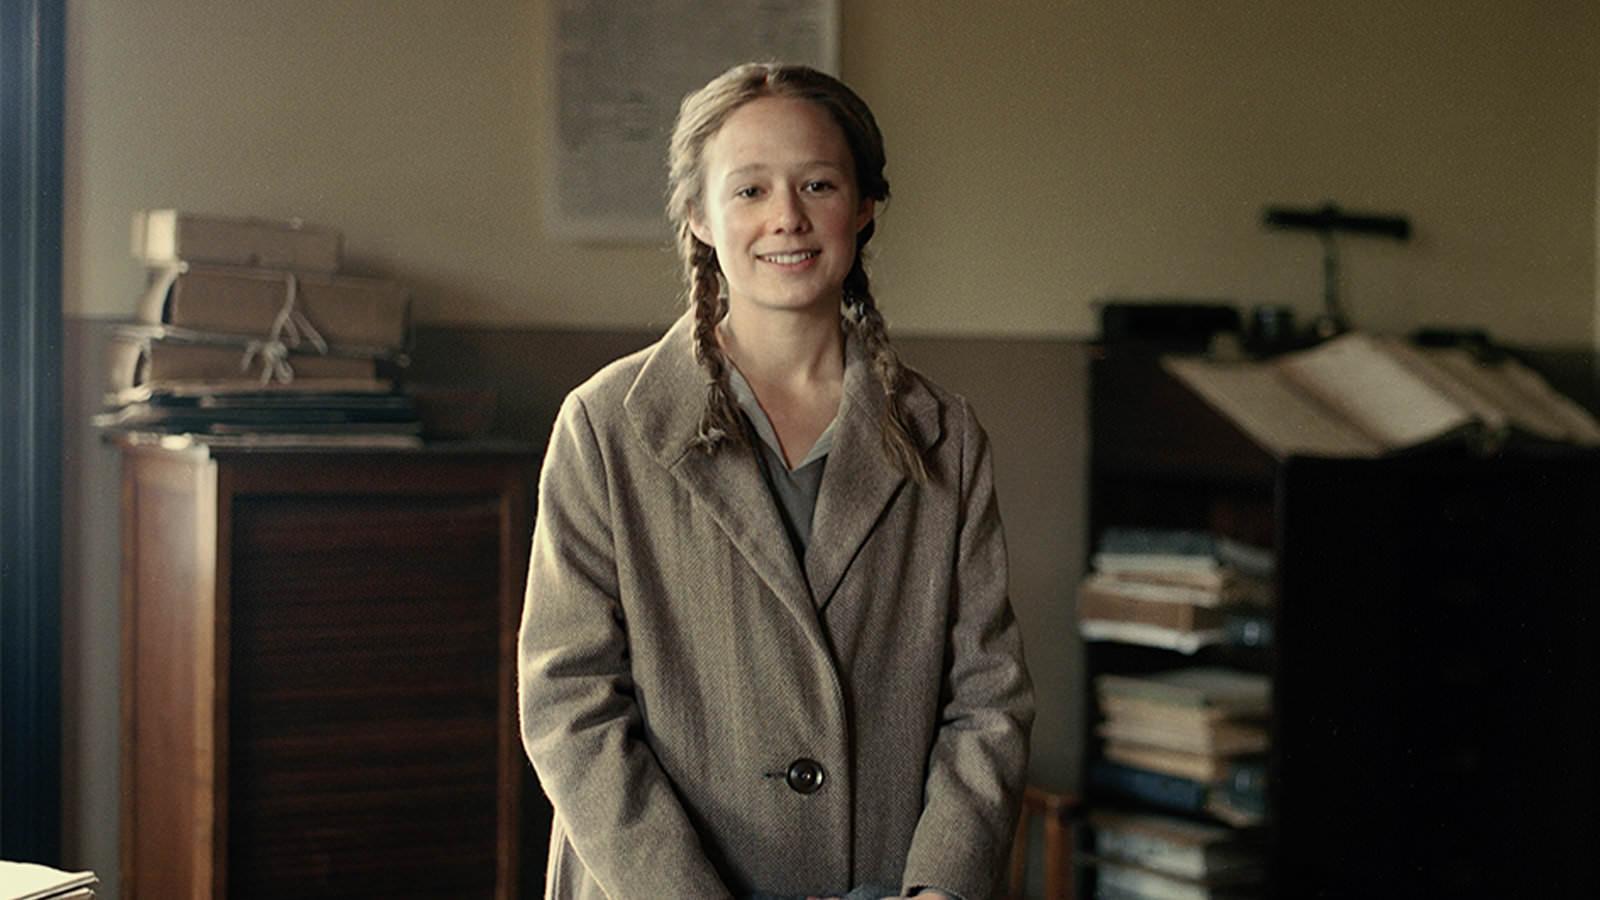 Movie, Unga Astrid(瑞典, 2018年) / 當幸福提早來(台灣) / Becoming Astrid(英文) / 关于阿斯特丽德(網路), 電影角色與演員介紹